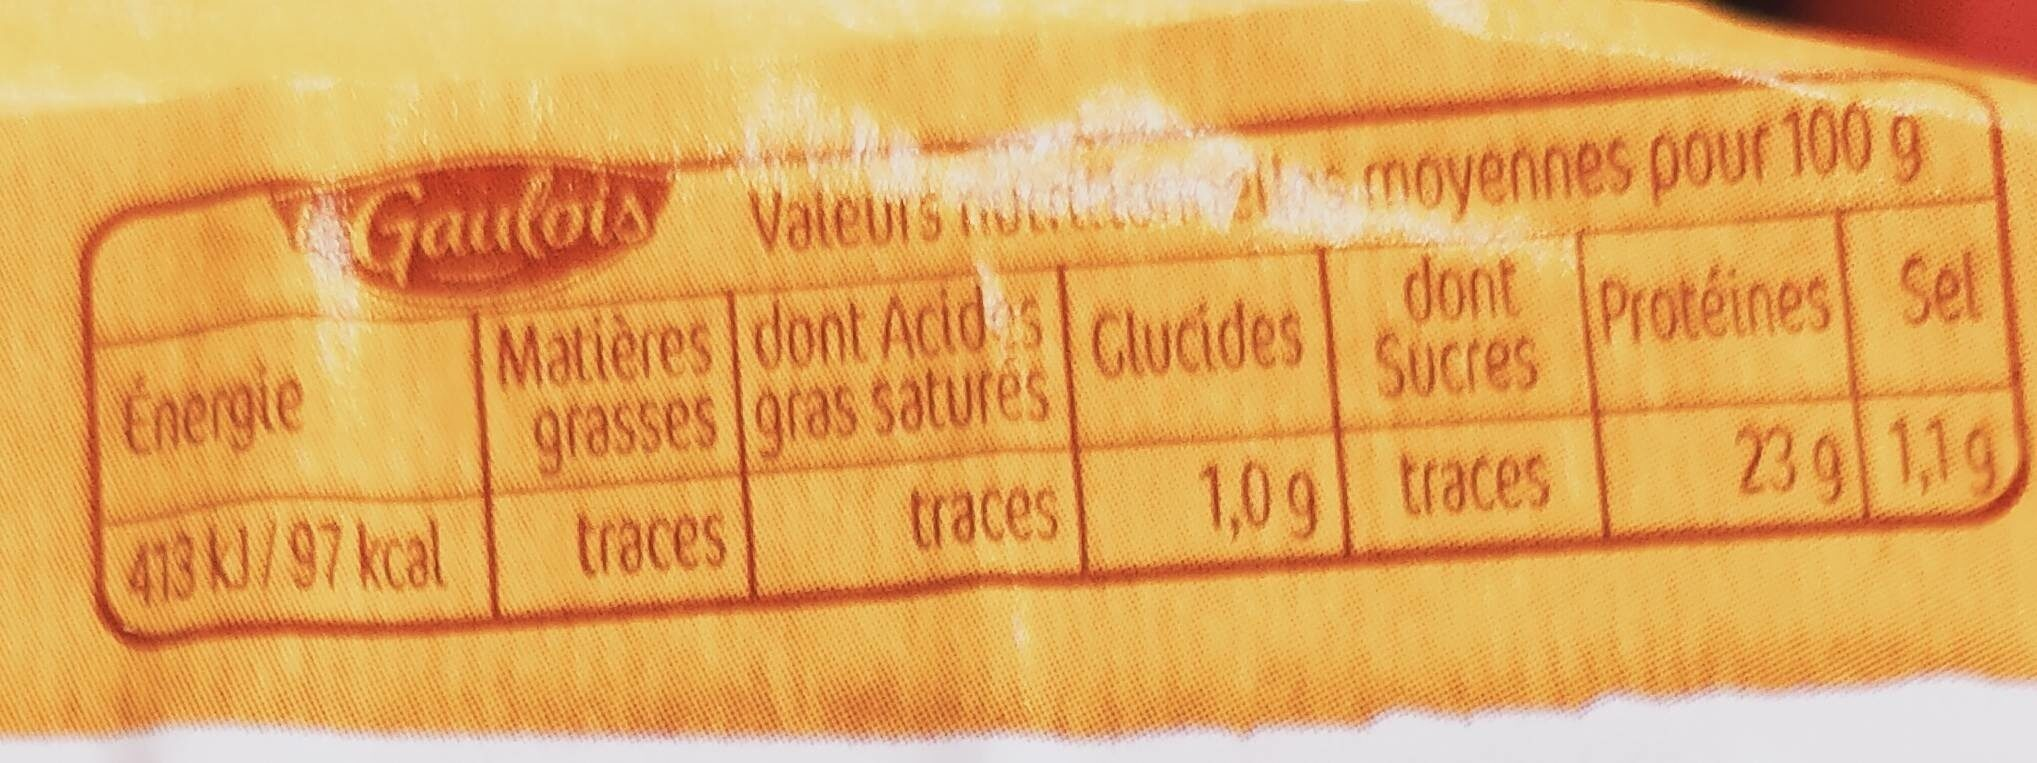 Escalope de dinde  extra tendre - Nutrition facts - fr